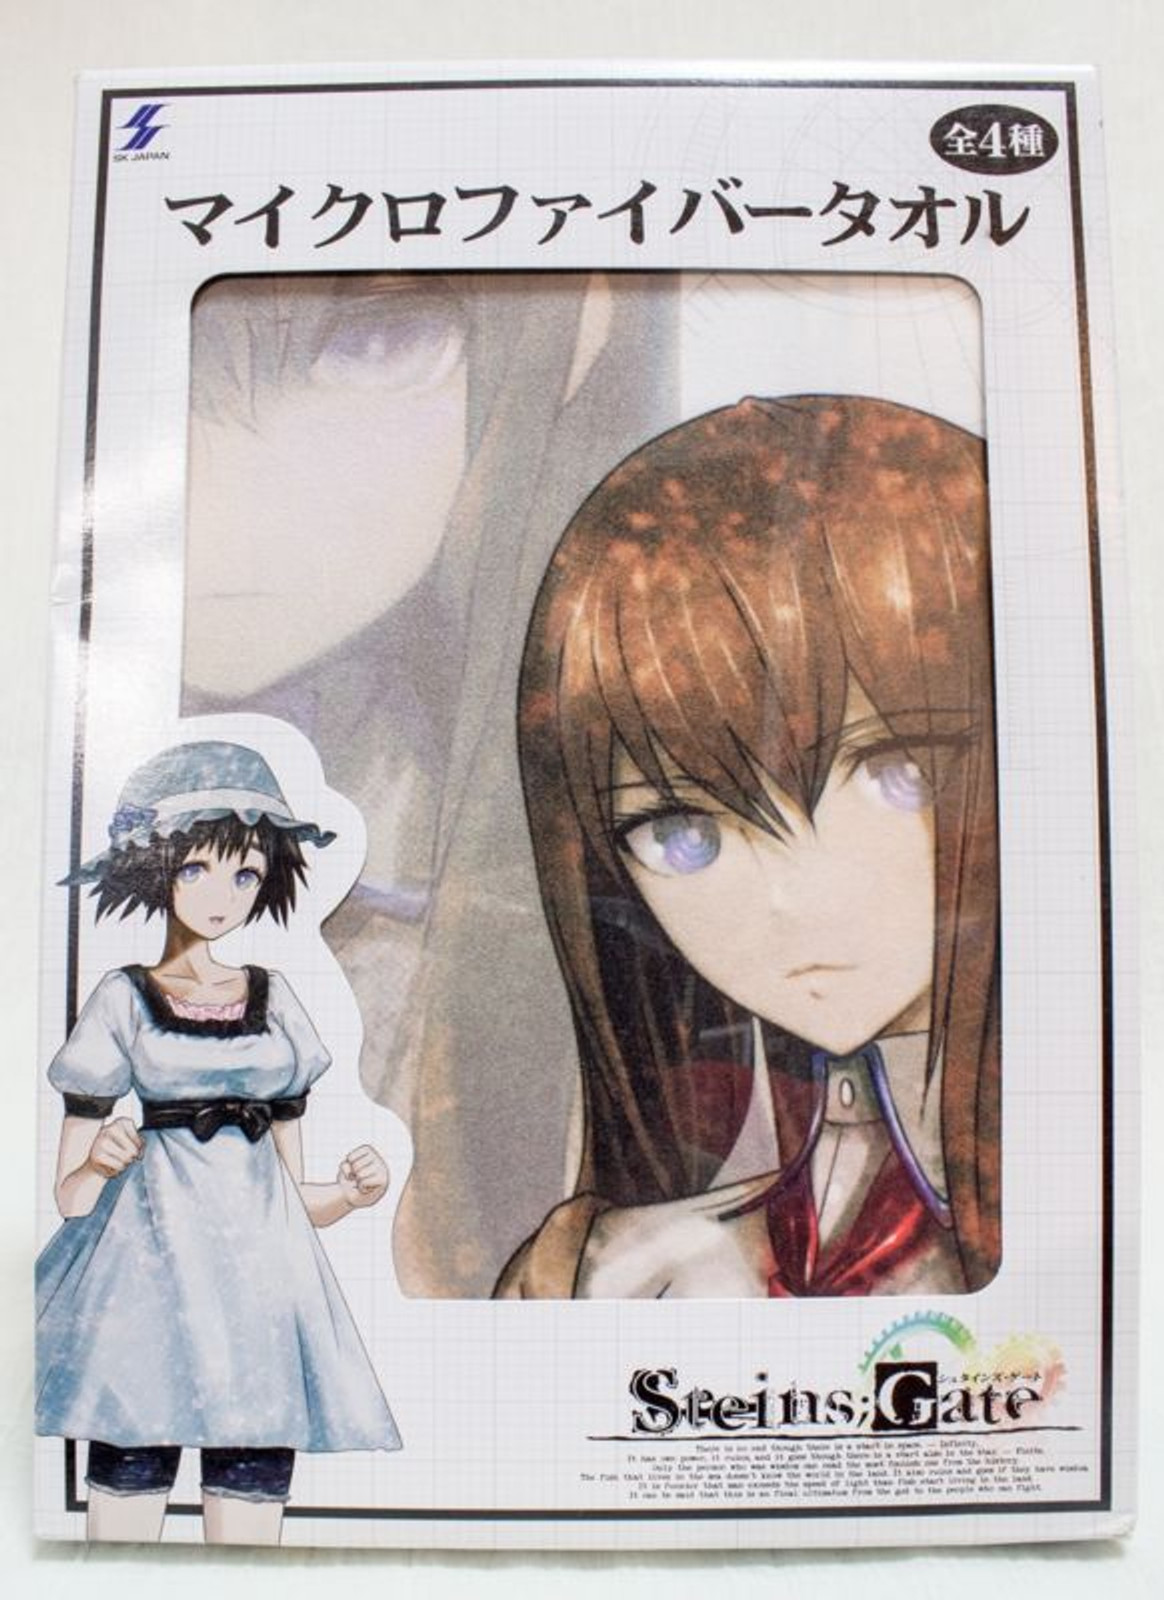 Steins ; Gate Kurisu Makise A ver. Micro Fiber 27 inch Towel JAPAN ANIME MANGA